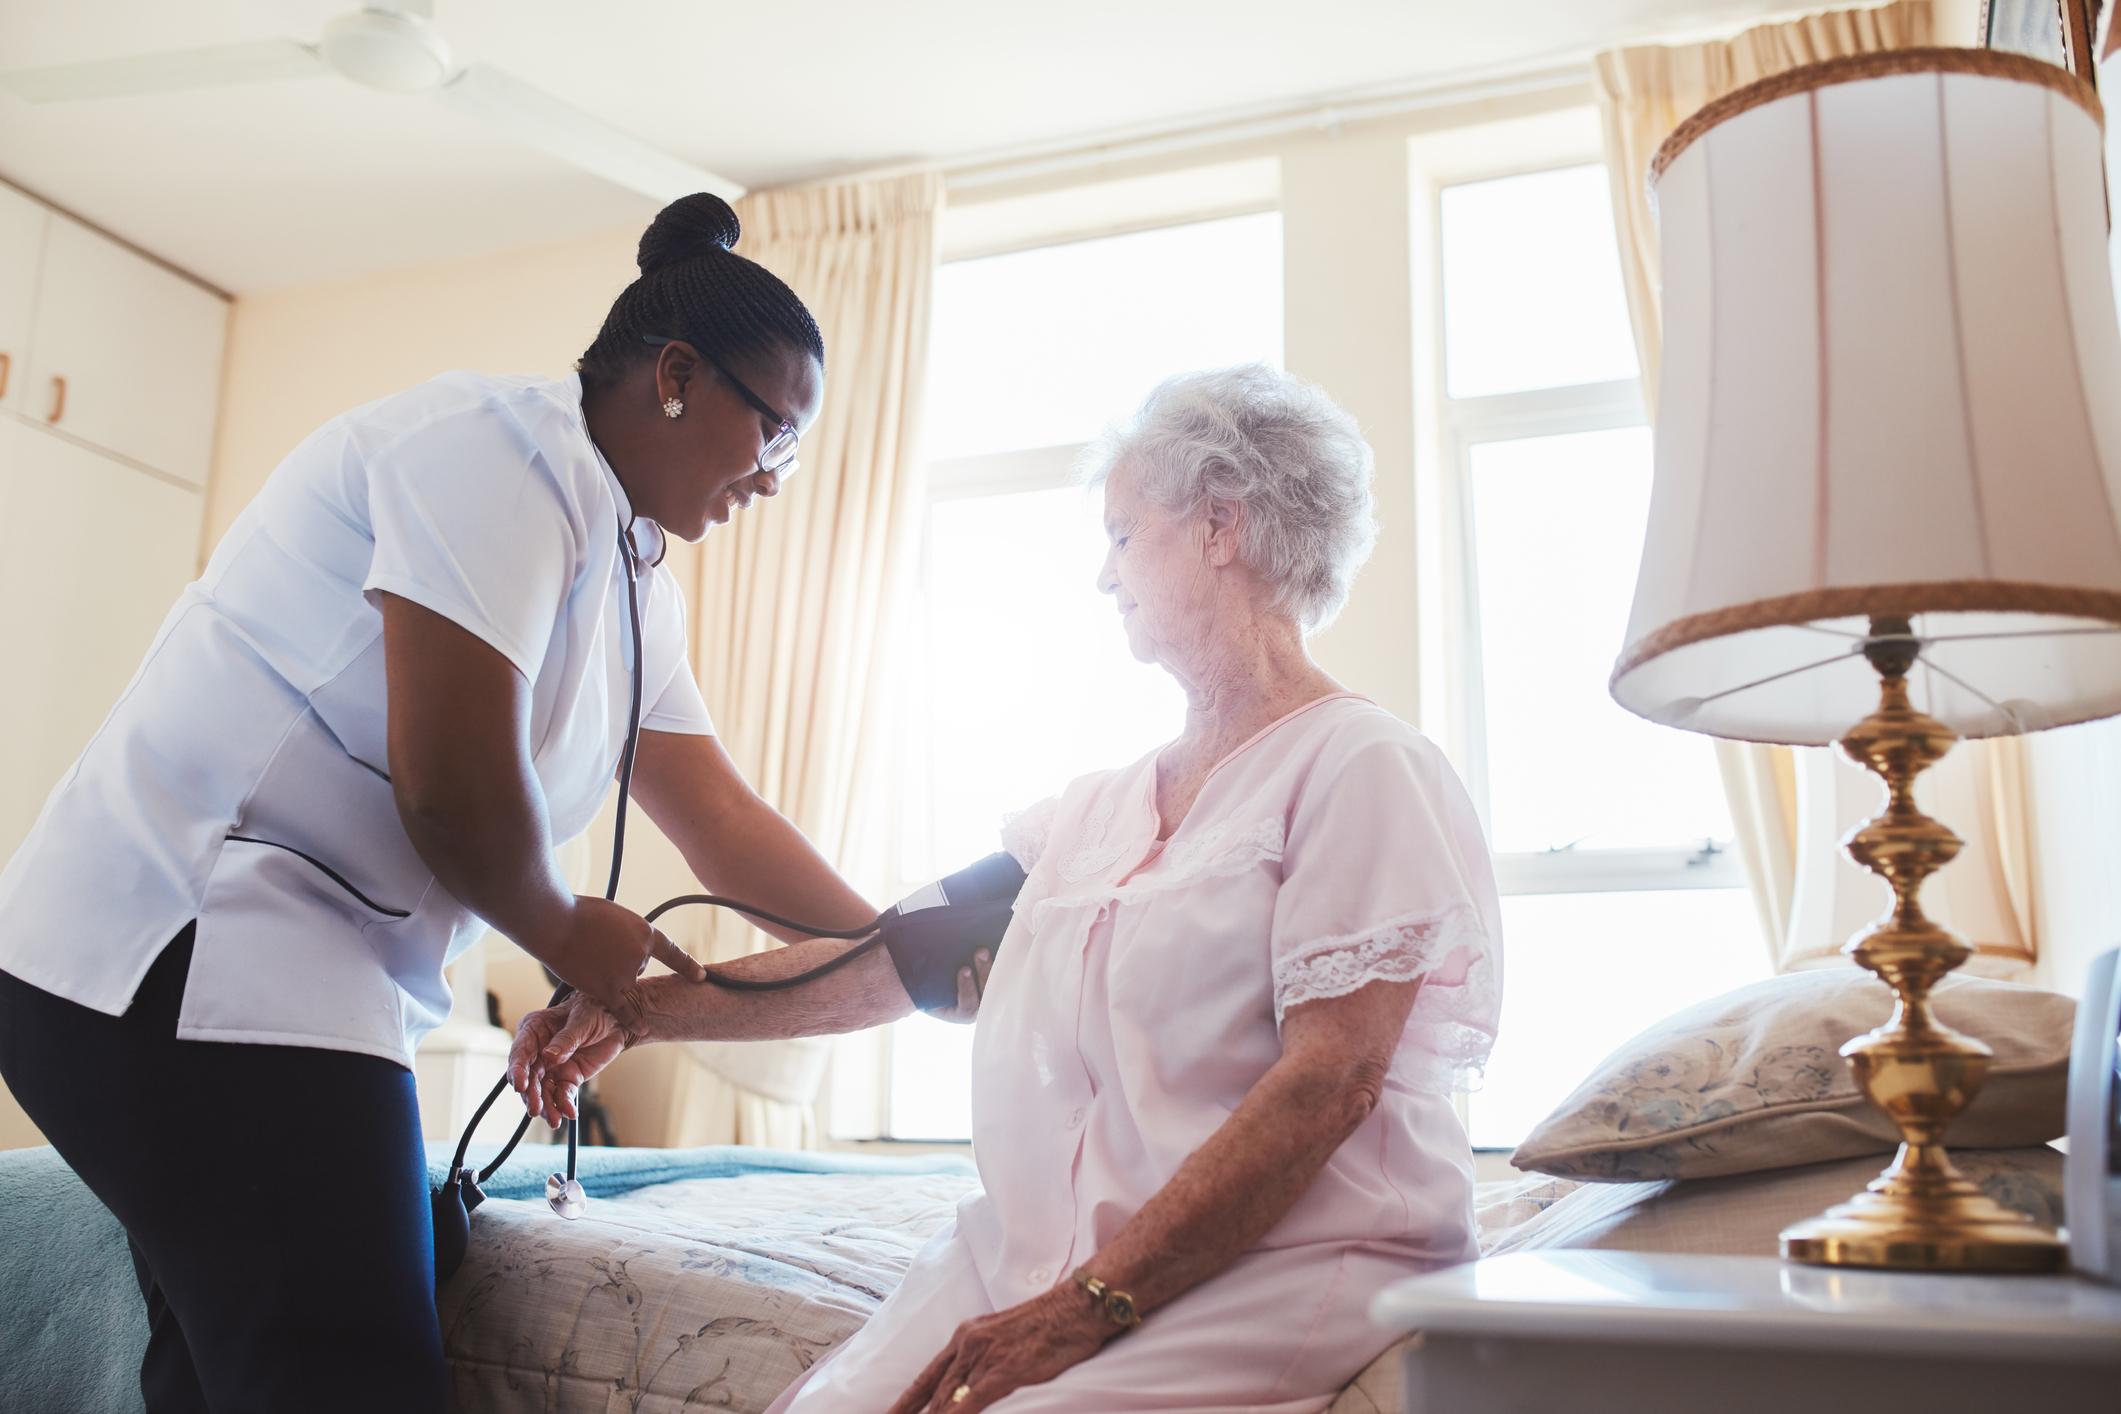 Nurse helping an elderly woman in a senior housing facility.